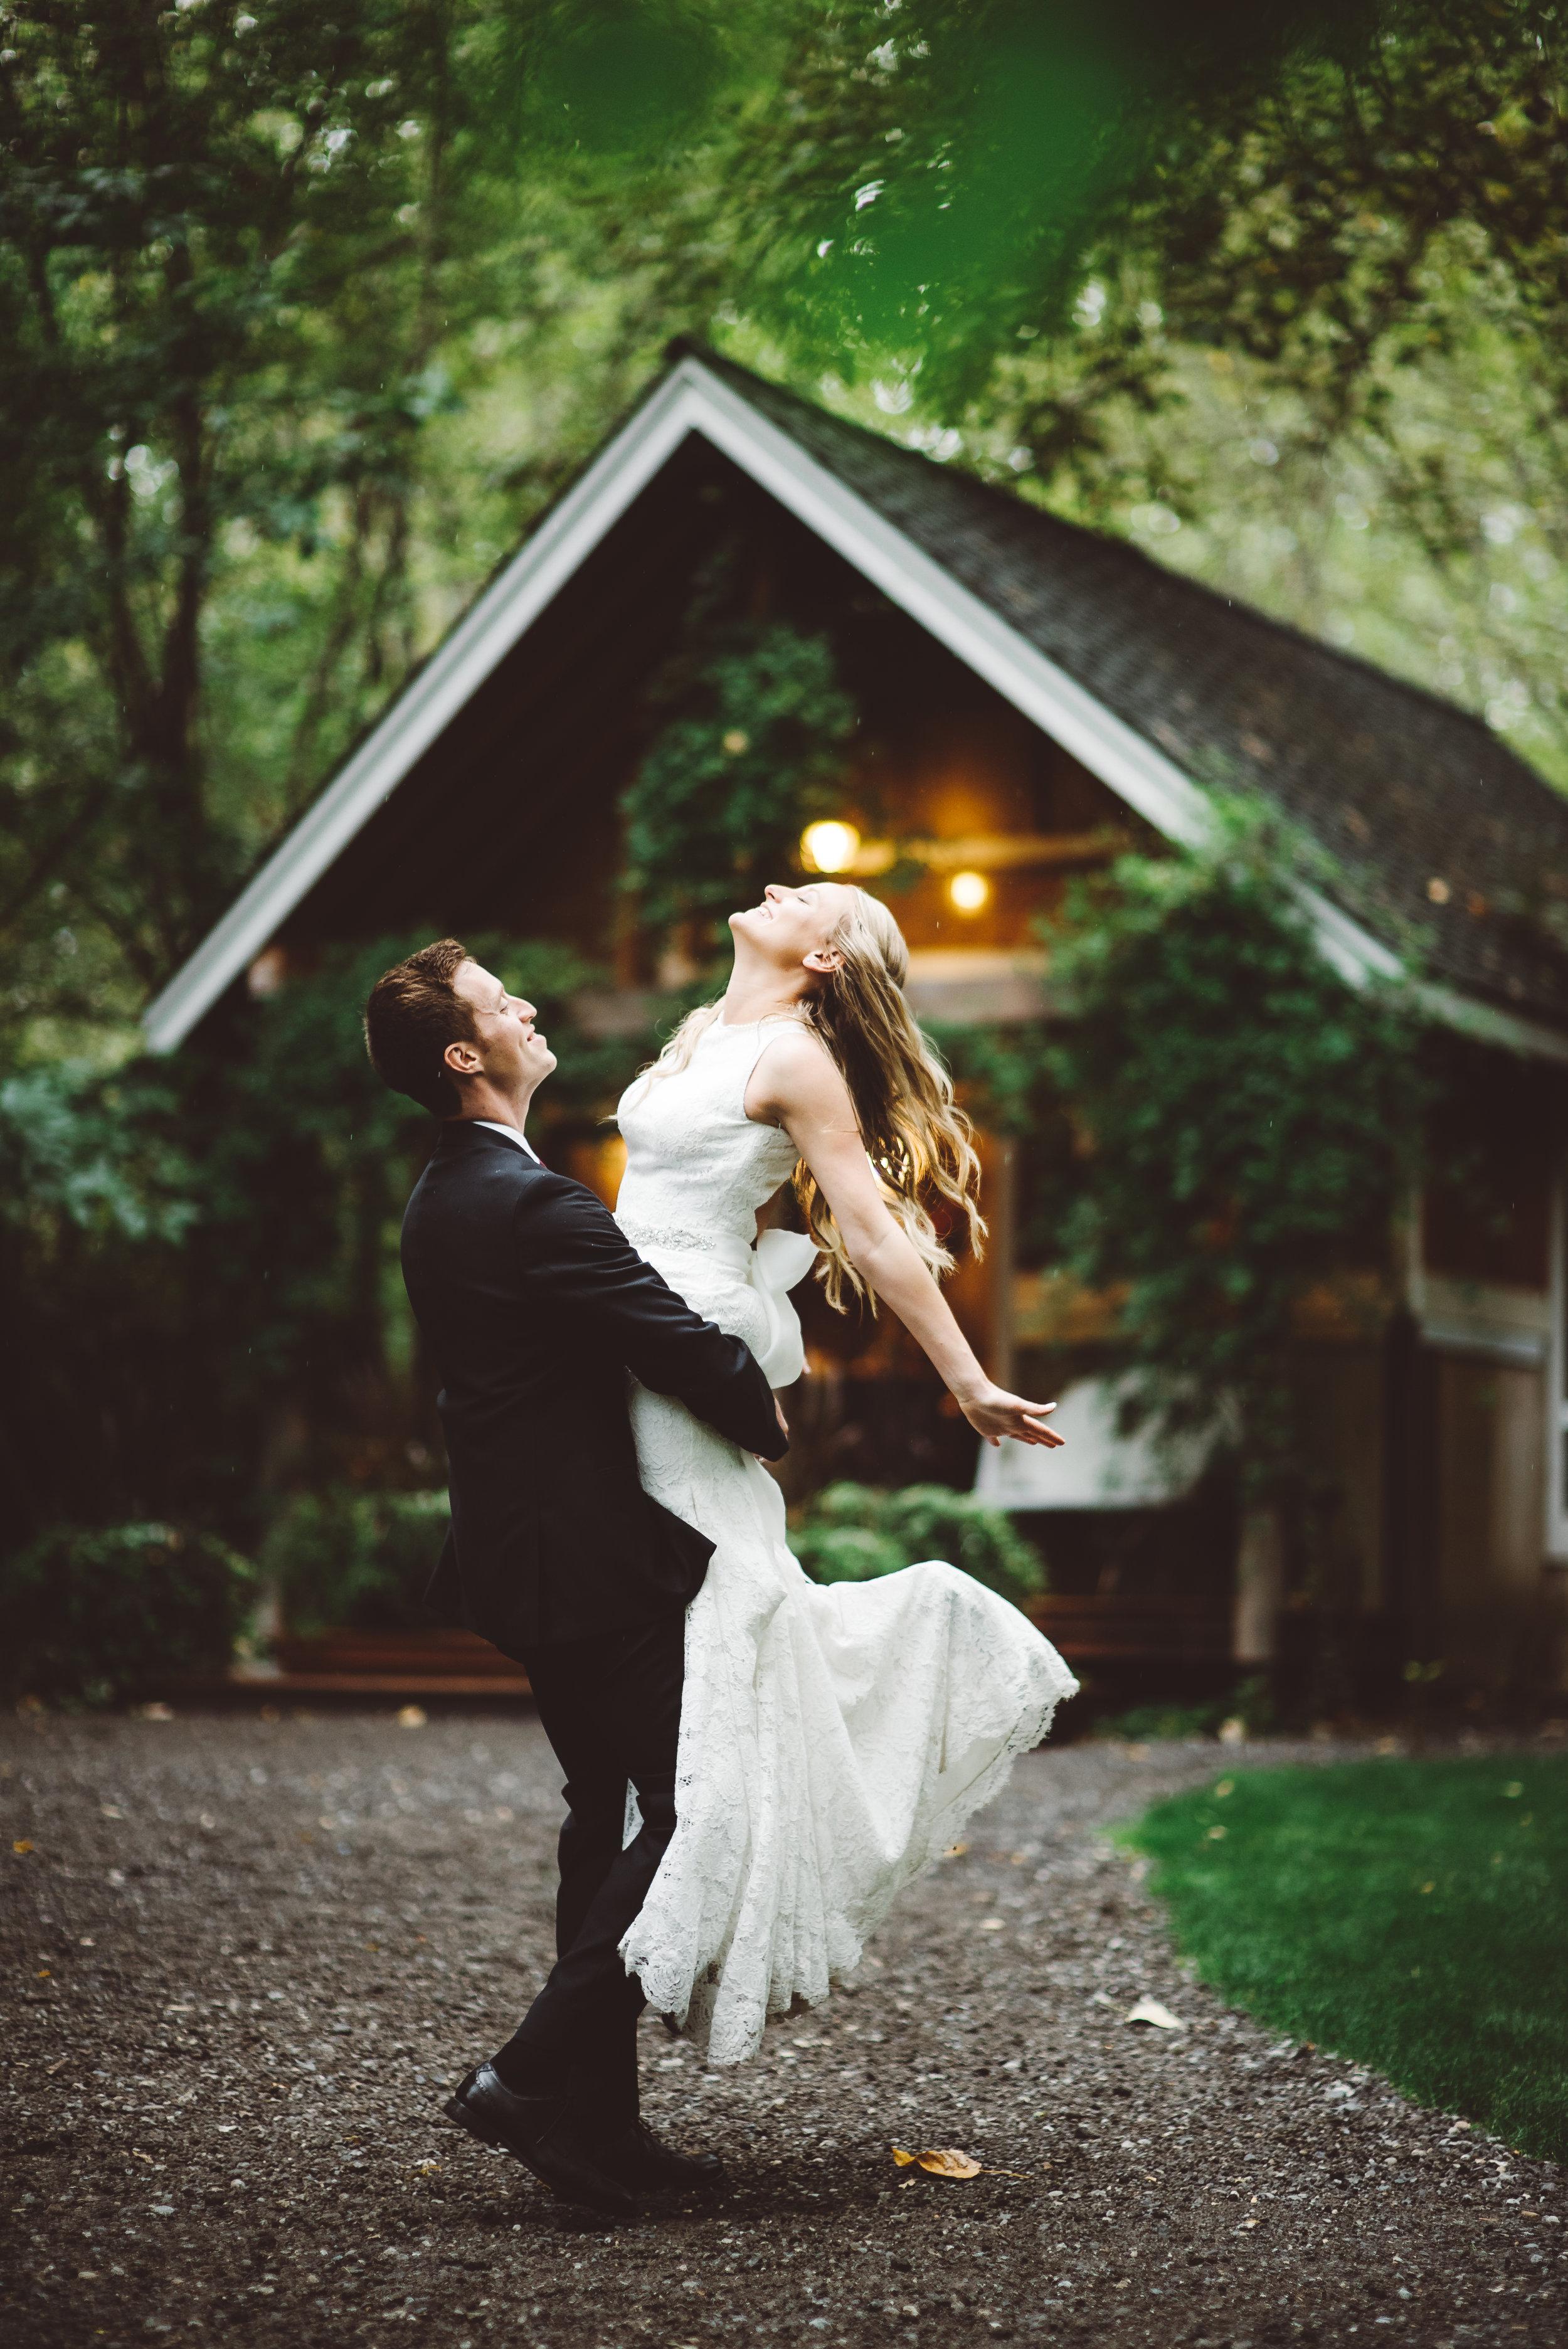 Caitylyn & Jesse - Wedding - Vintage-469.jpg